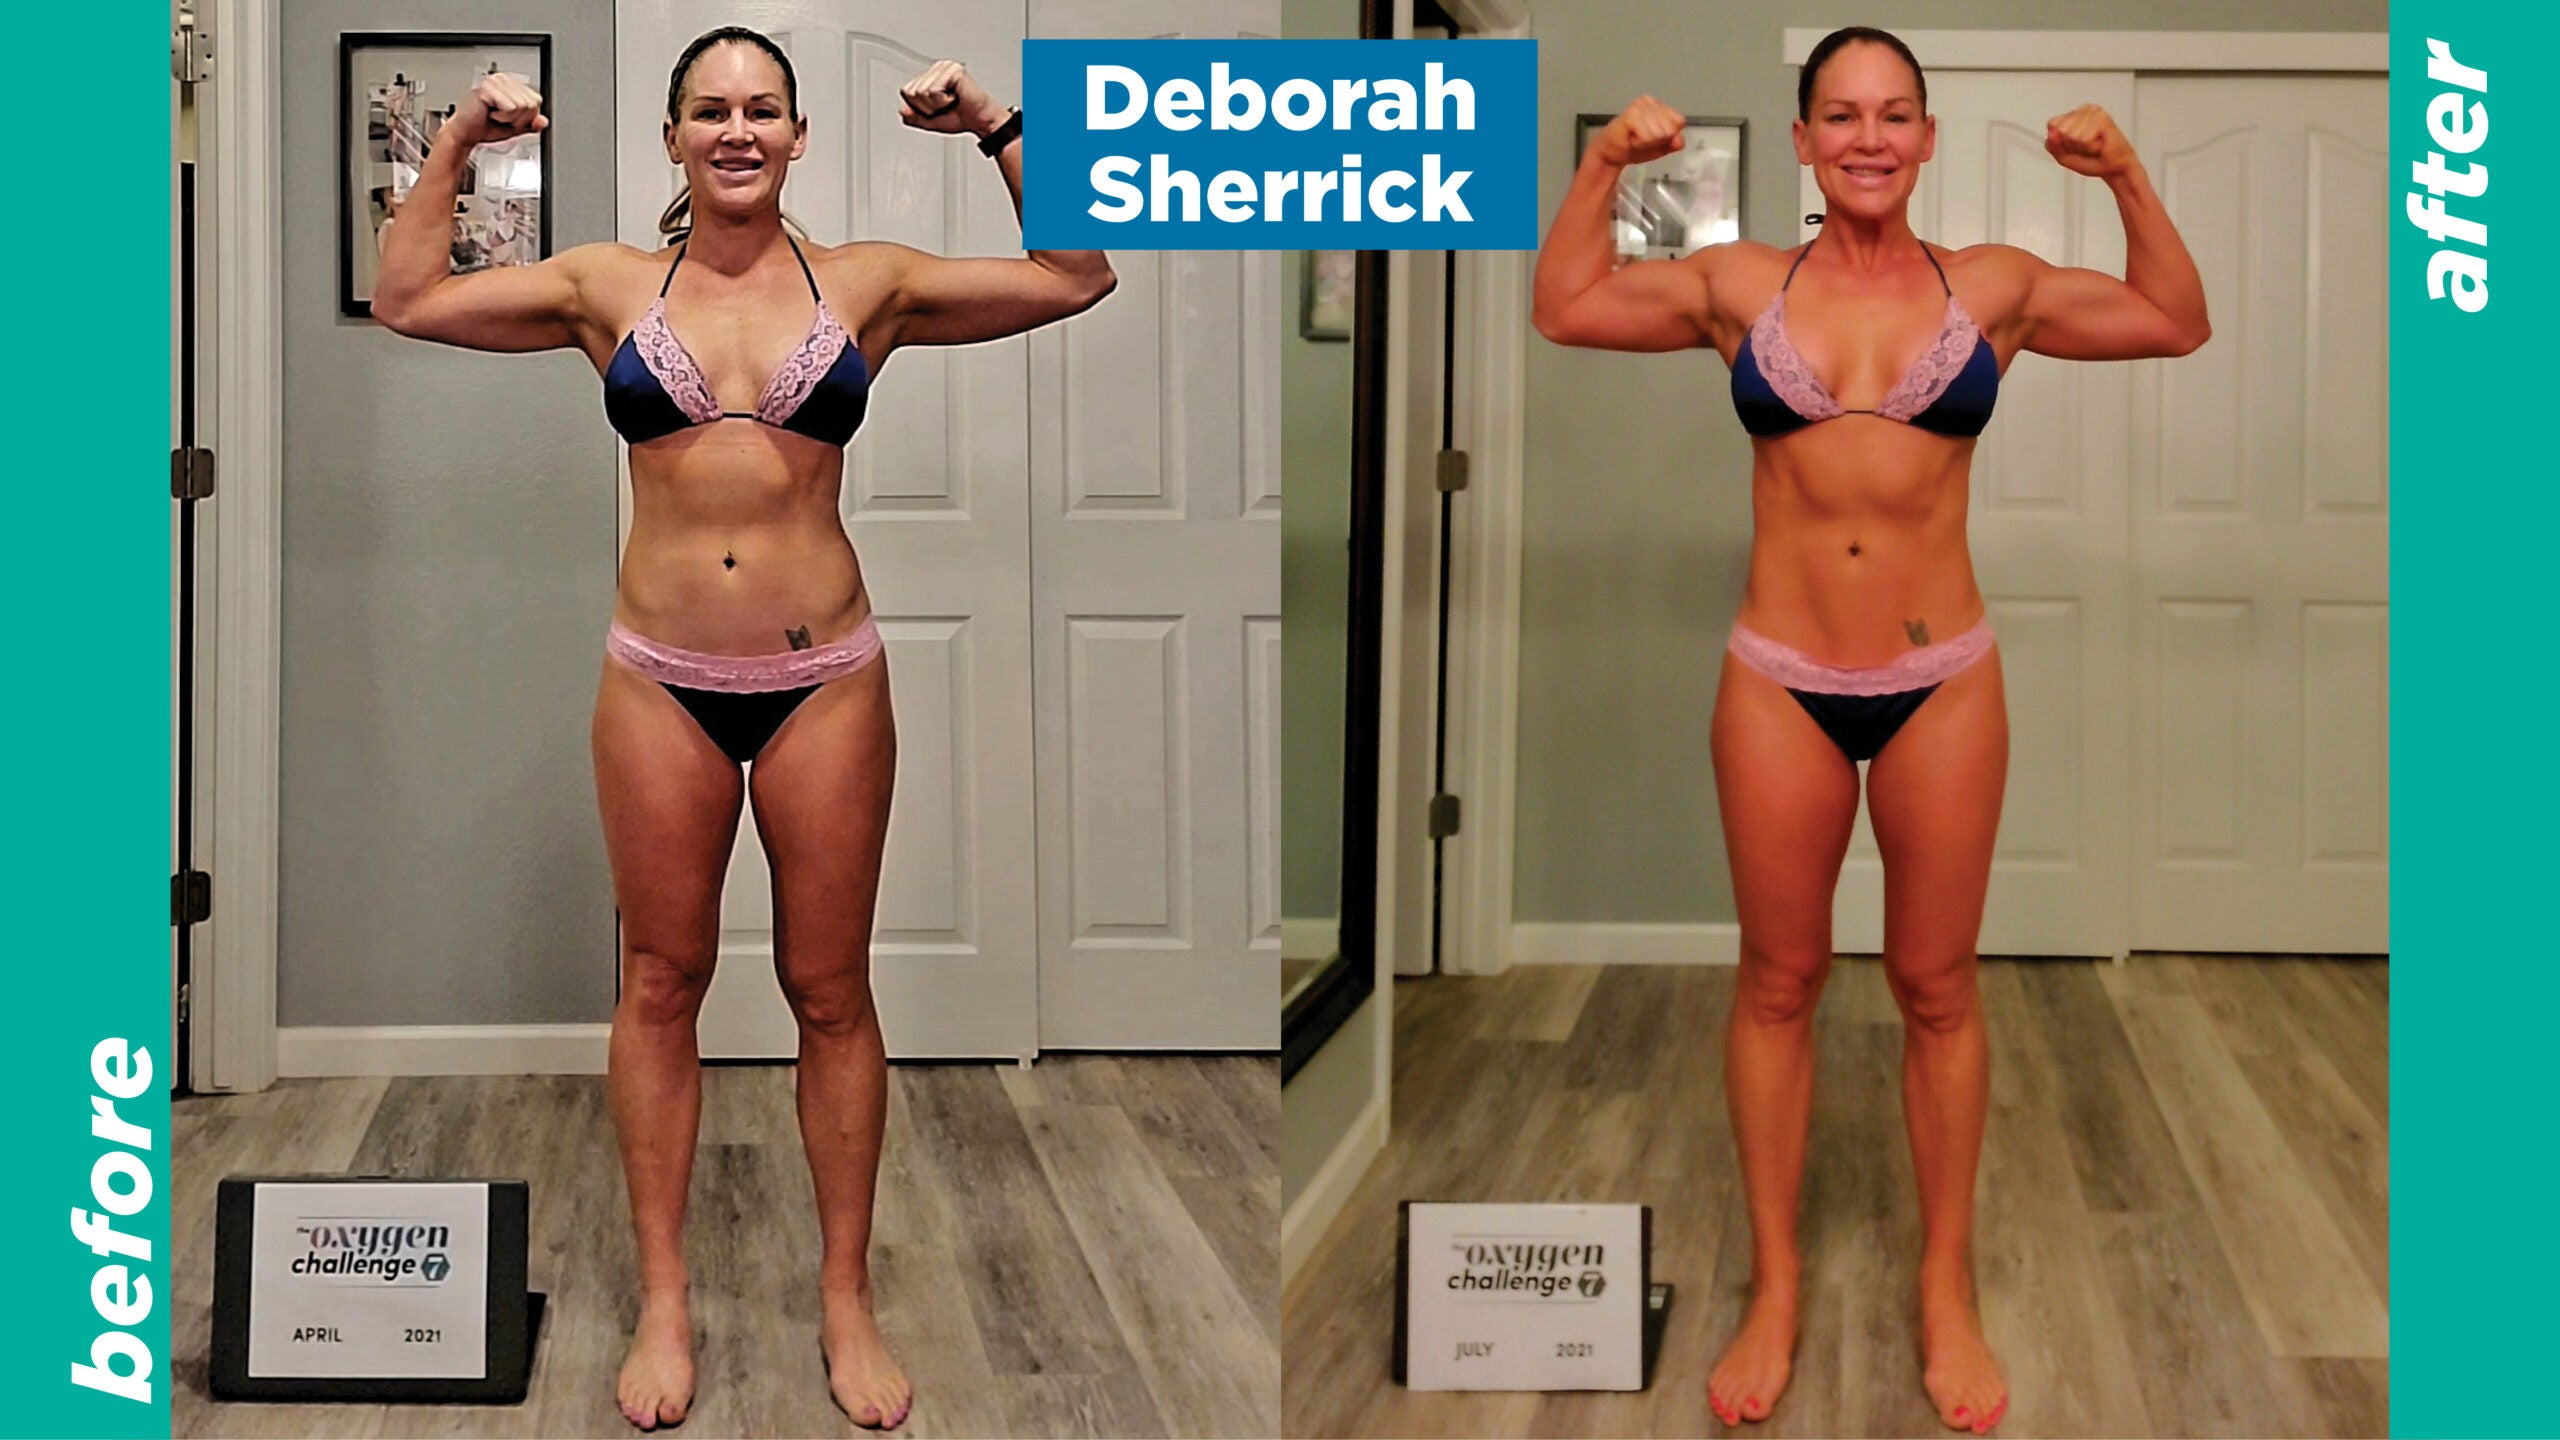 Deborah Sherrick